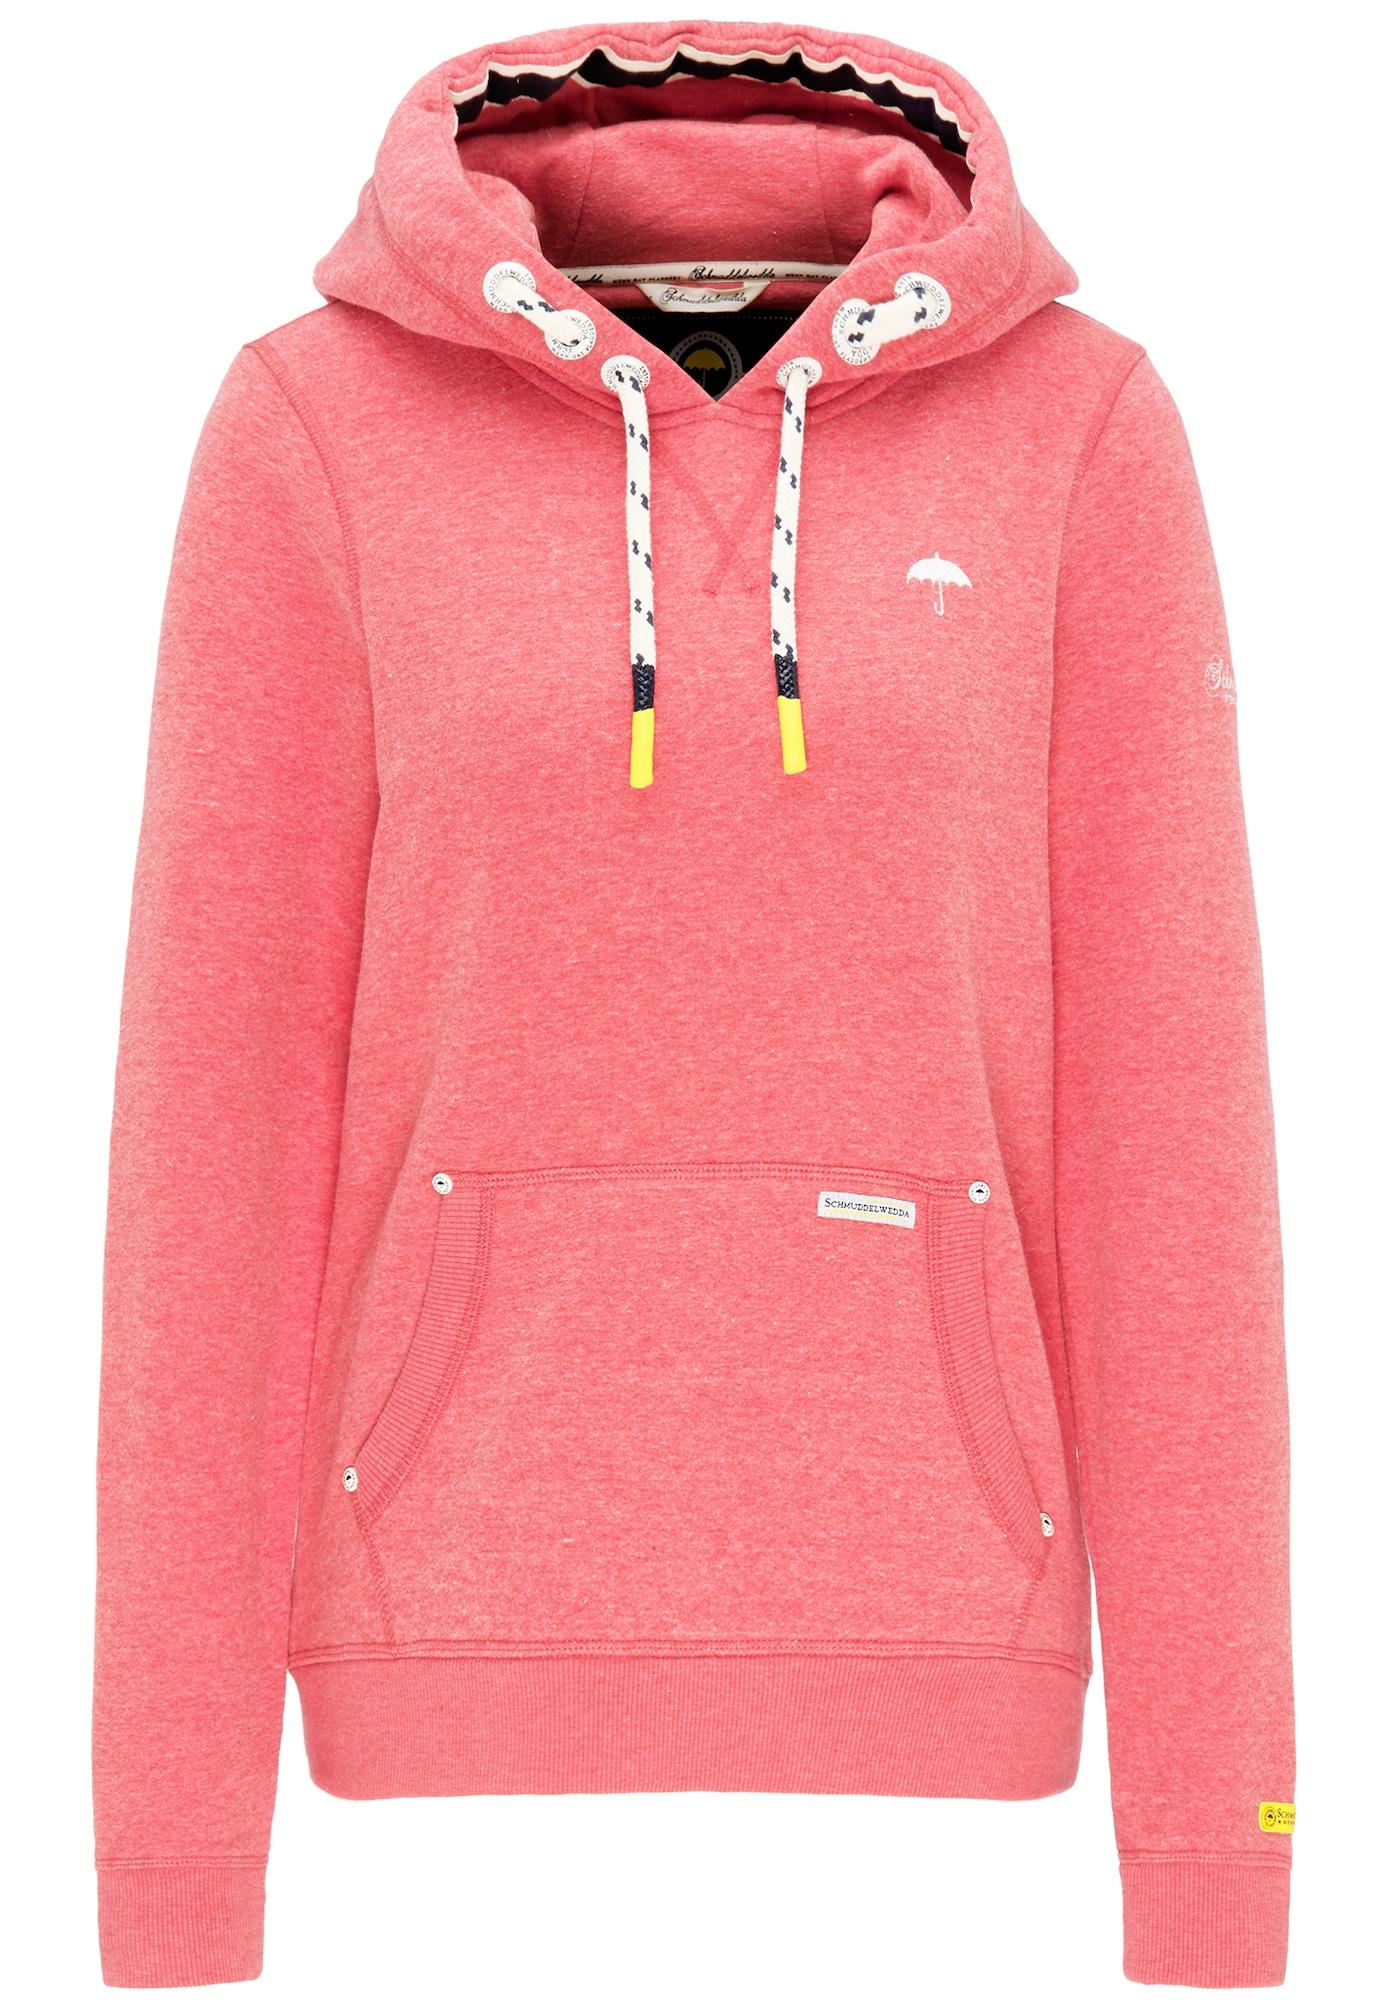 Schmuddelwedda Sportlicher Damen Kapuzenpullover | Bekleidung > Pullover > Kapuzenpullover | Schmuddelwedda